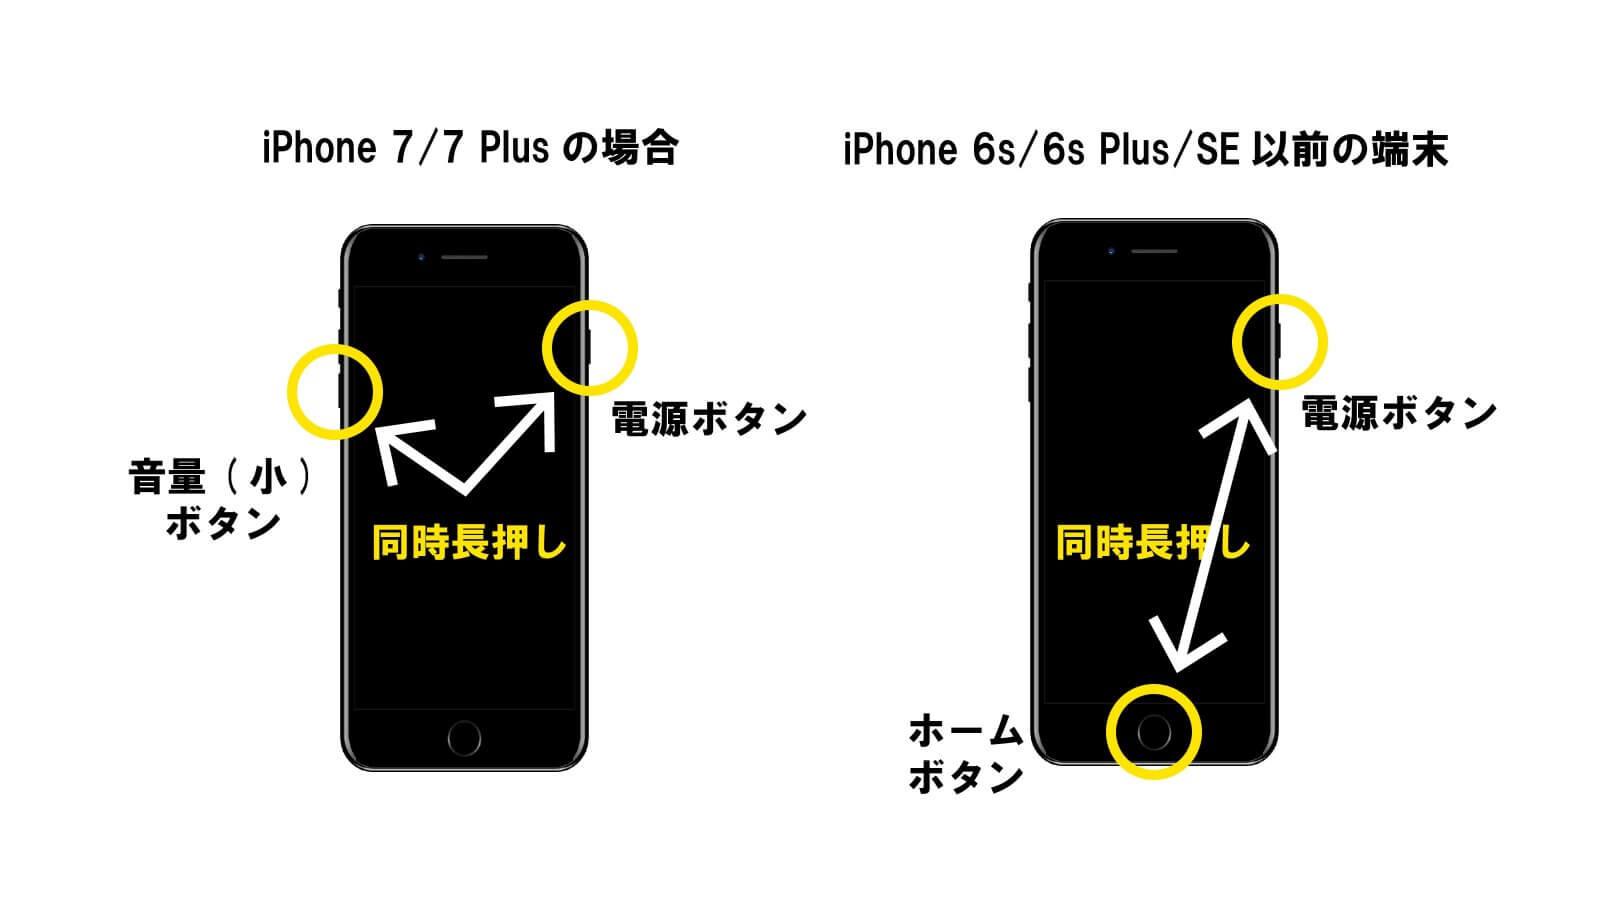 iphone操作。7以前の機種の強制再起動の方法。